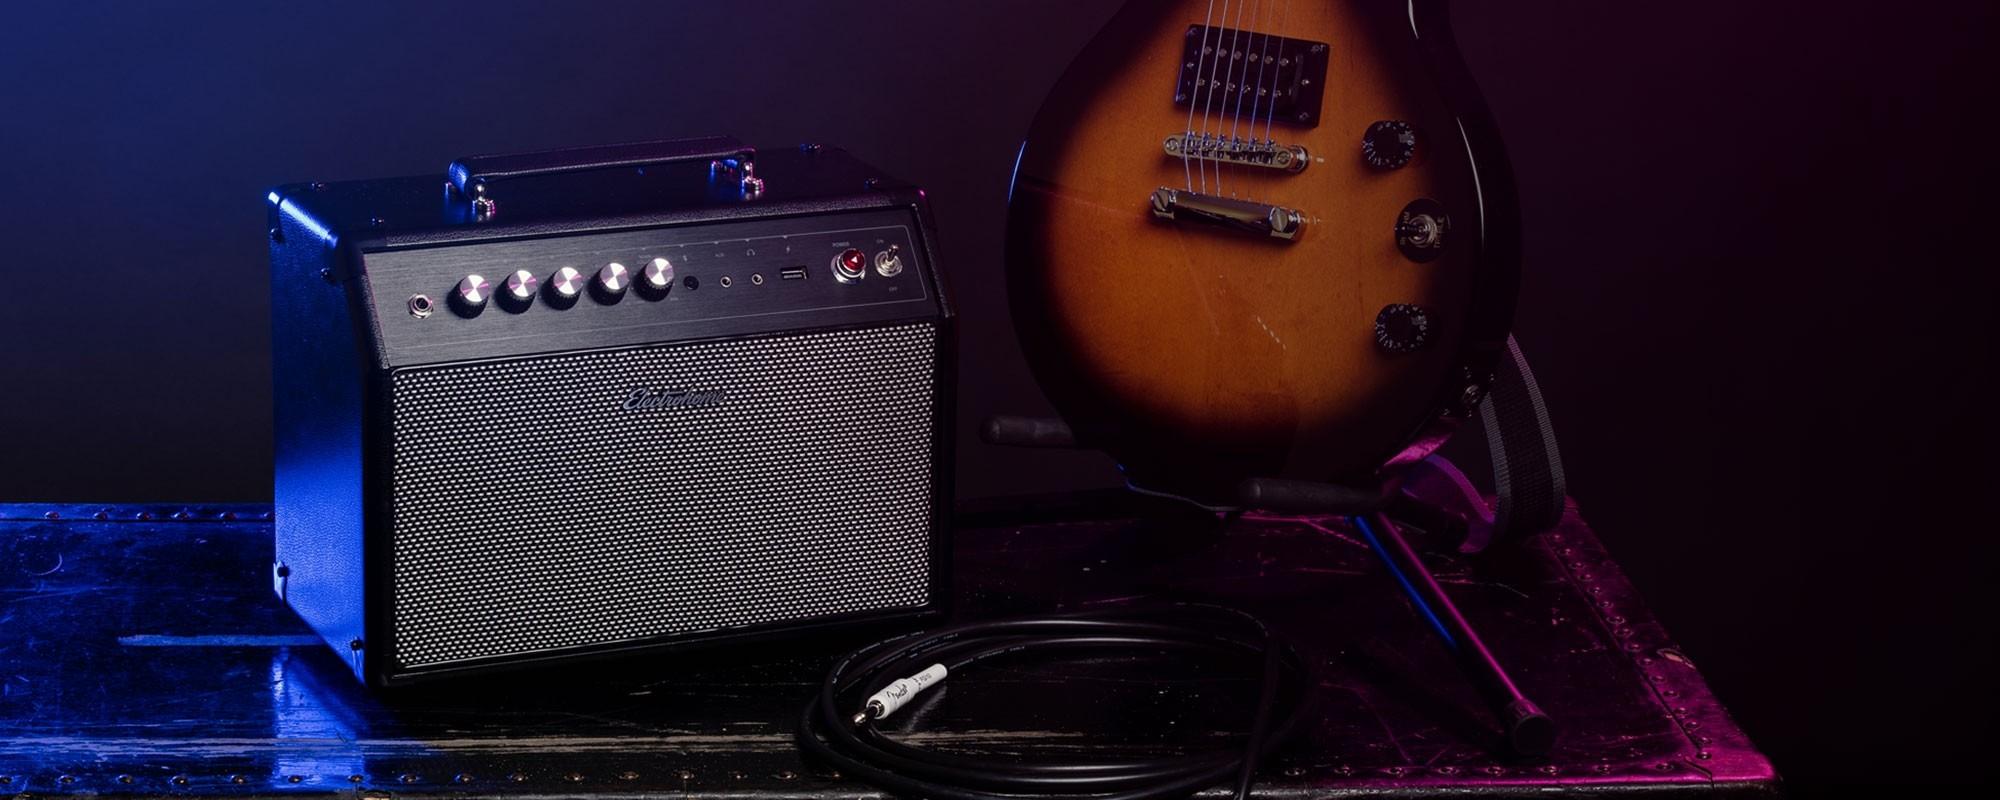 Birmingham High Performance Retro Music System with Gibson guitar